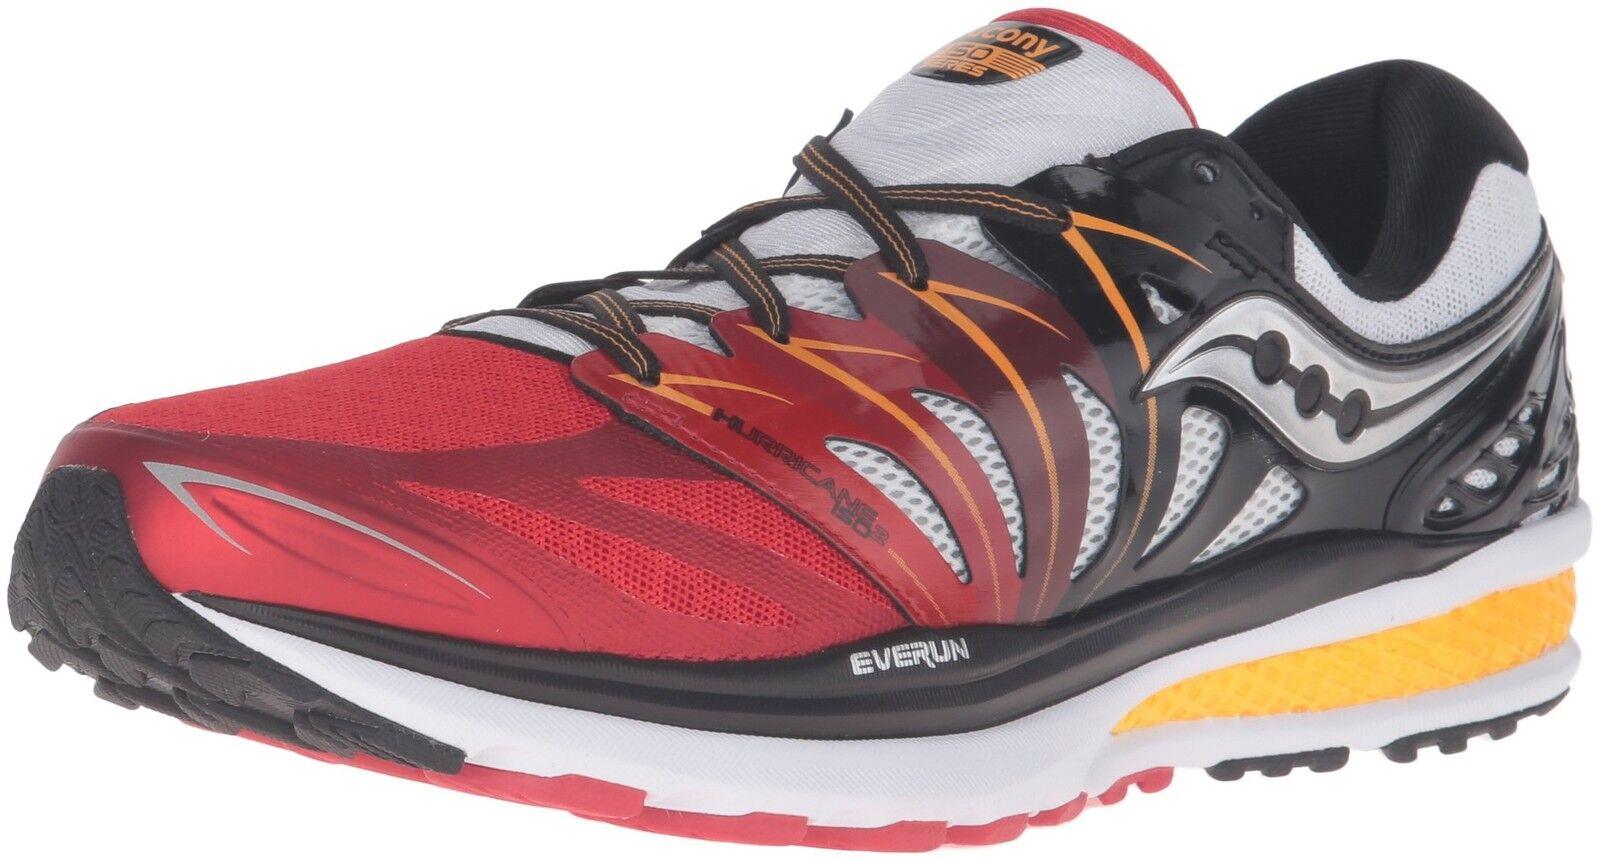 Saucony 2 Uomo scarpe- Hurricane ISO 2 Saucony rosso/bianca/arancia Size 7 M US bc2070